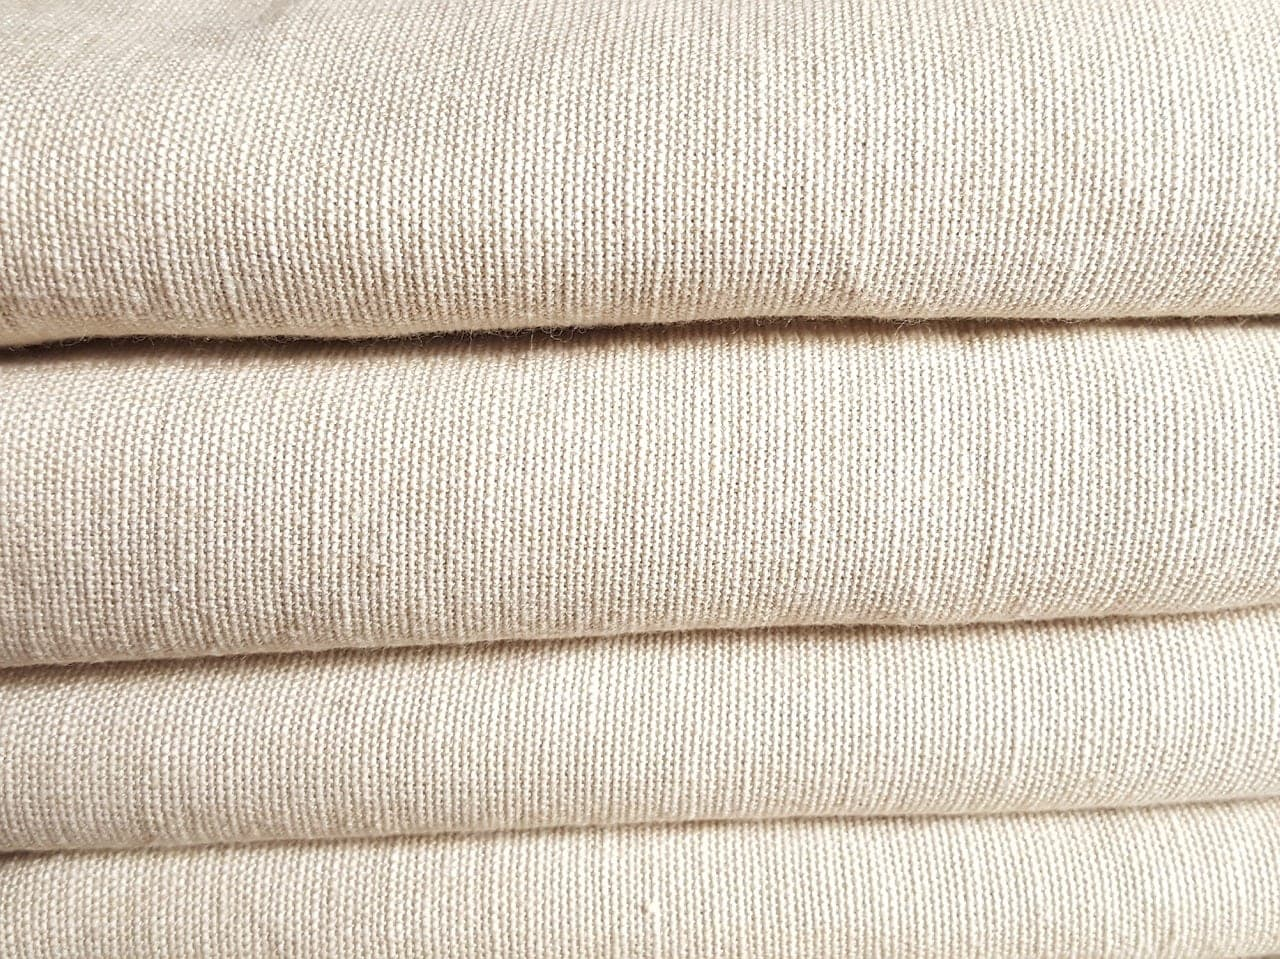 Inna•b Flax Textile Tesatura De In